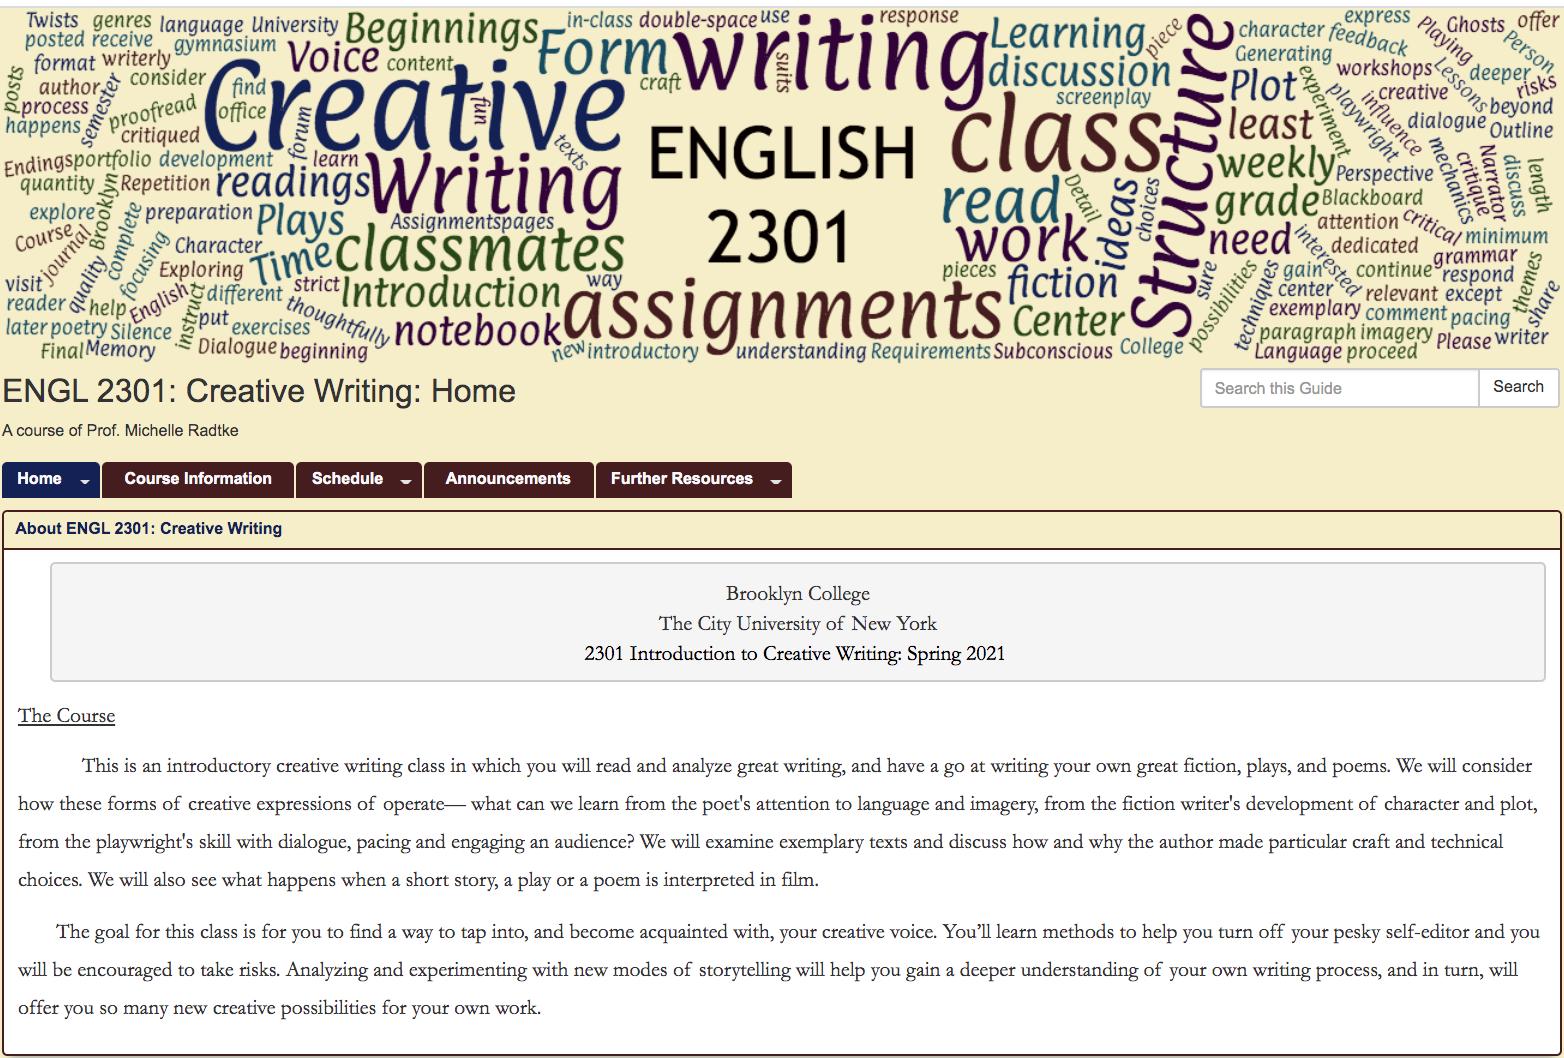 ENGL 2301: Creative Writing